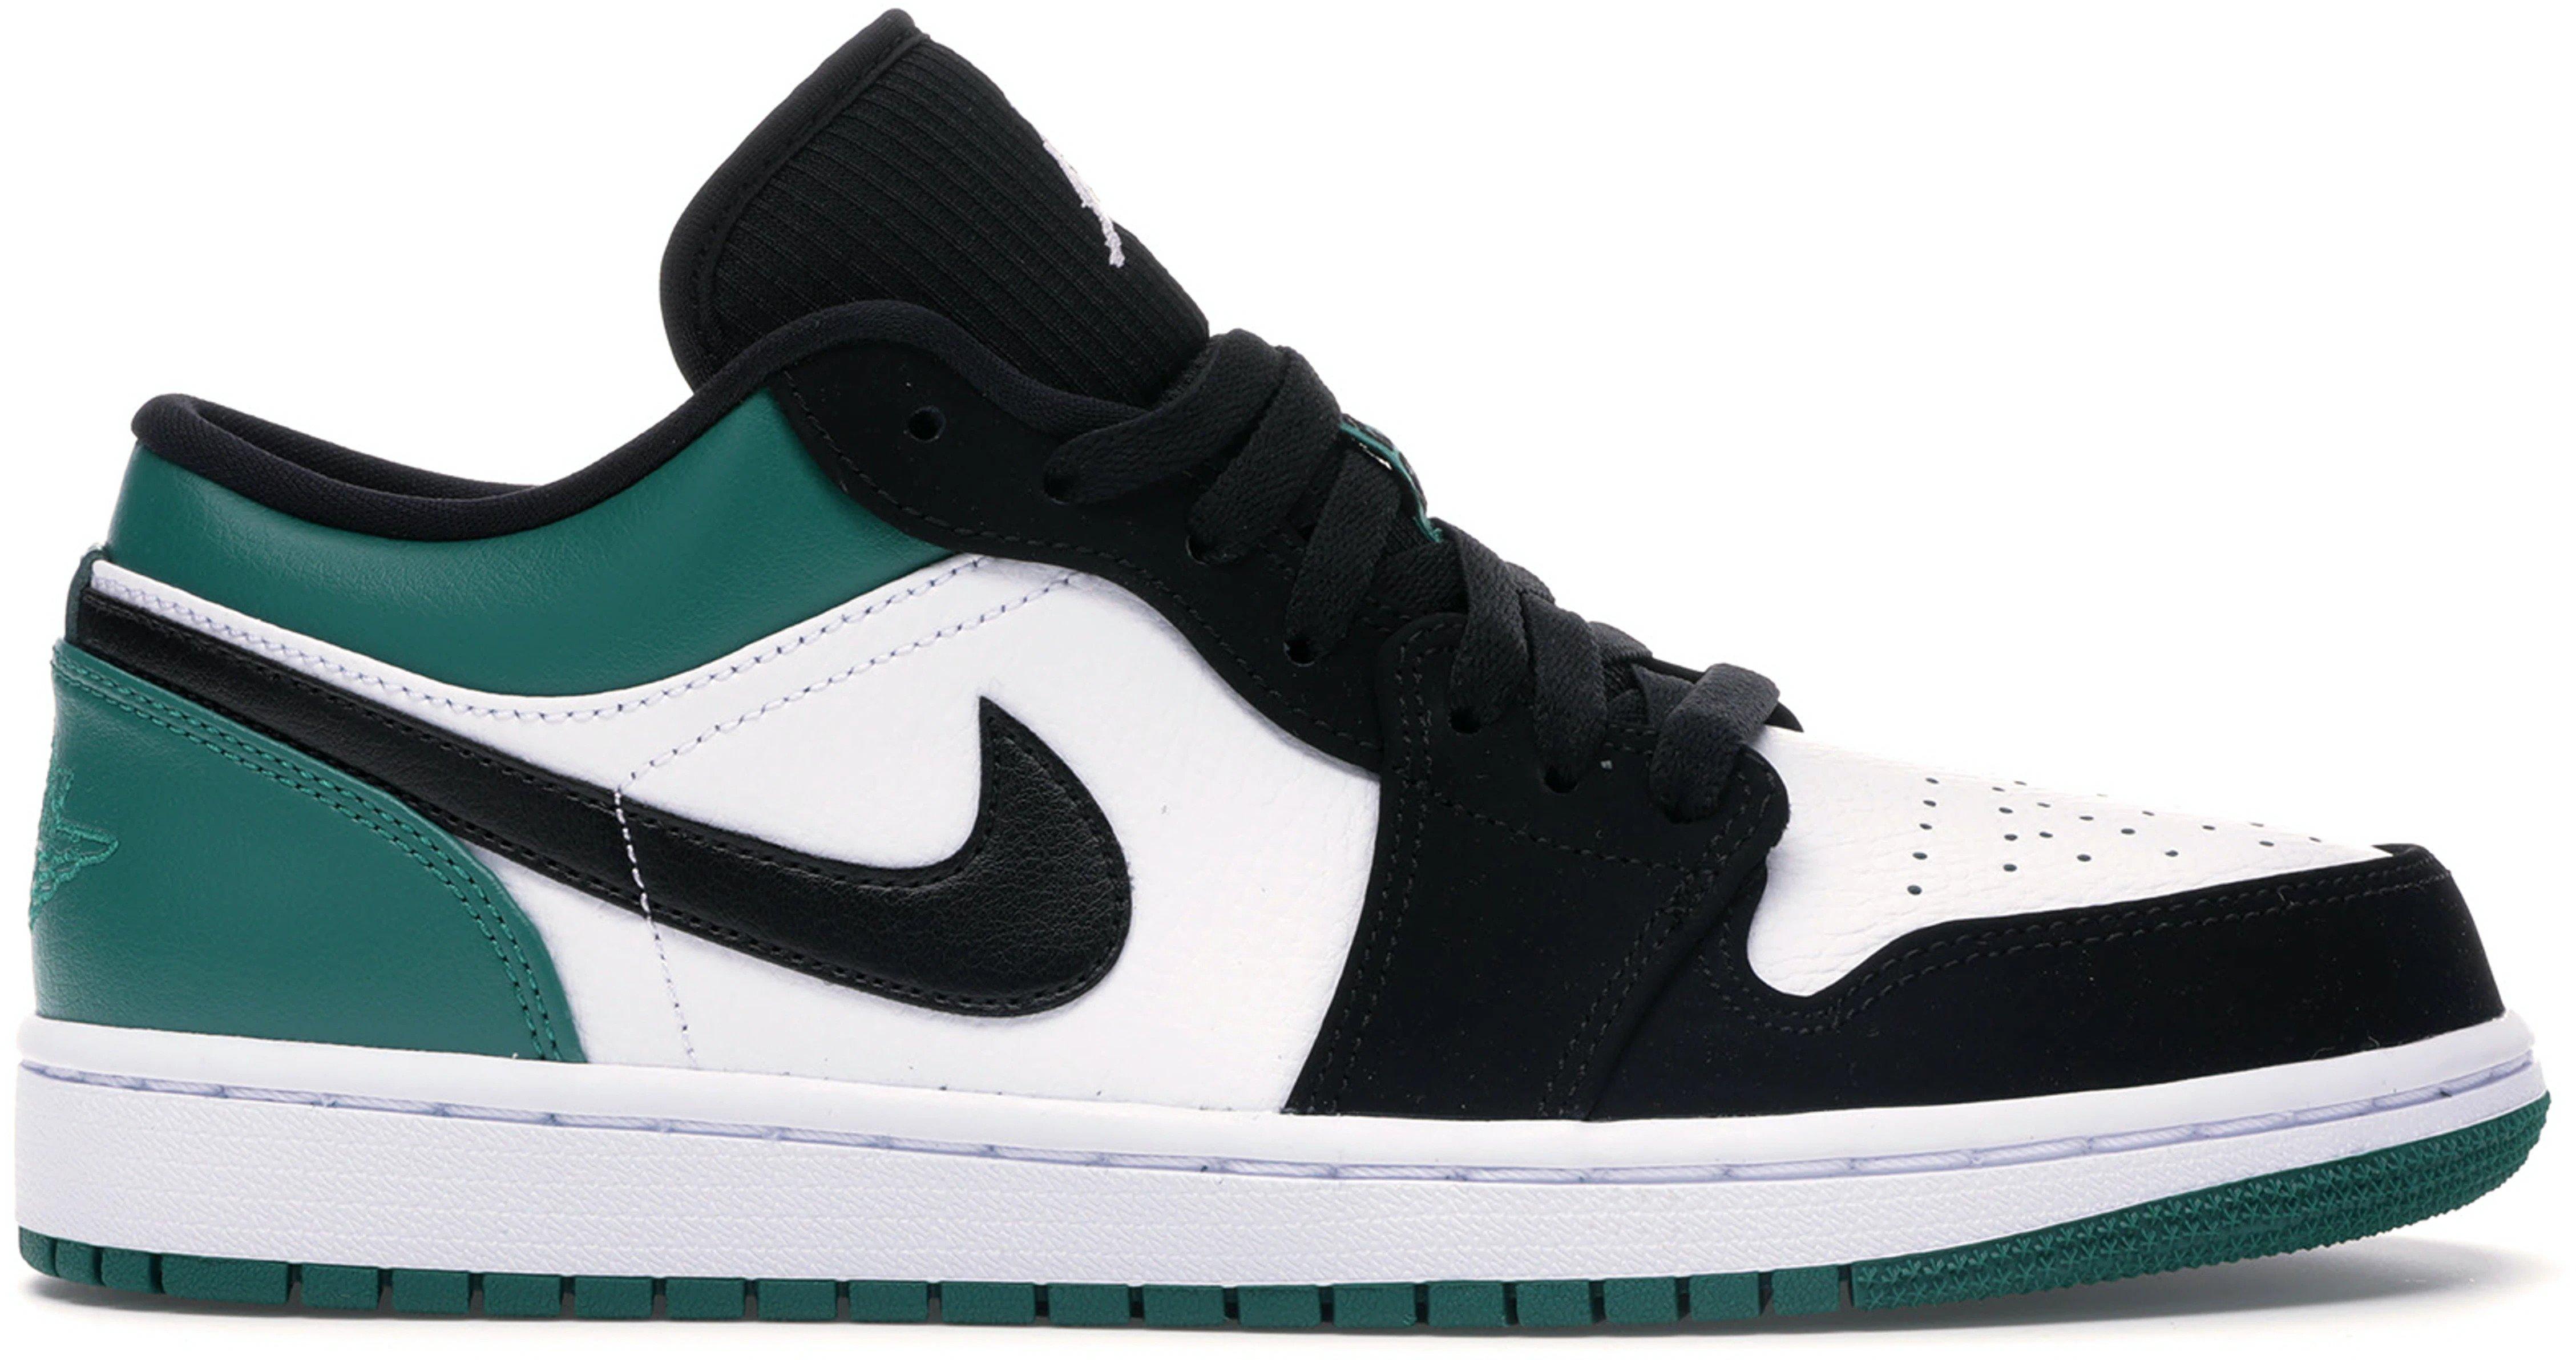 slide 1 - Jordan 1 Low White Black Mystic Green